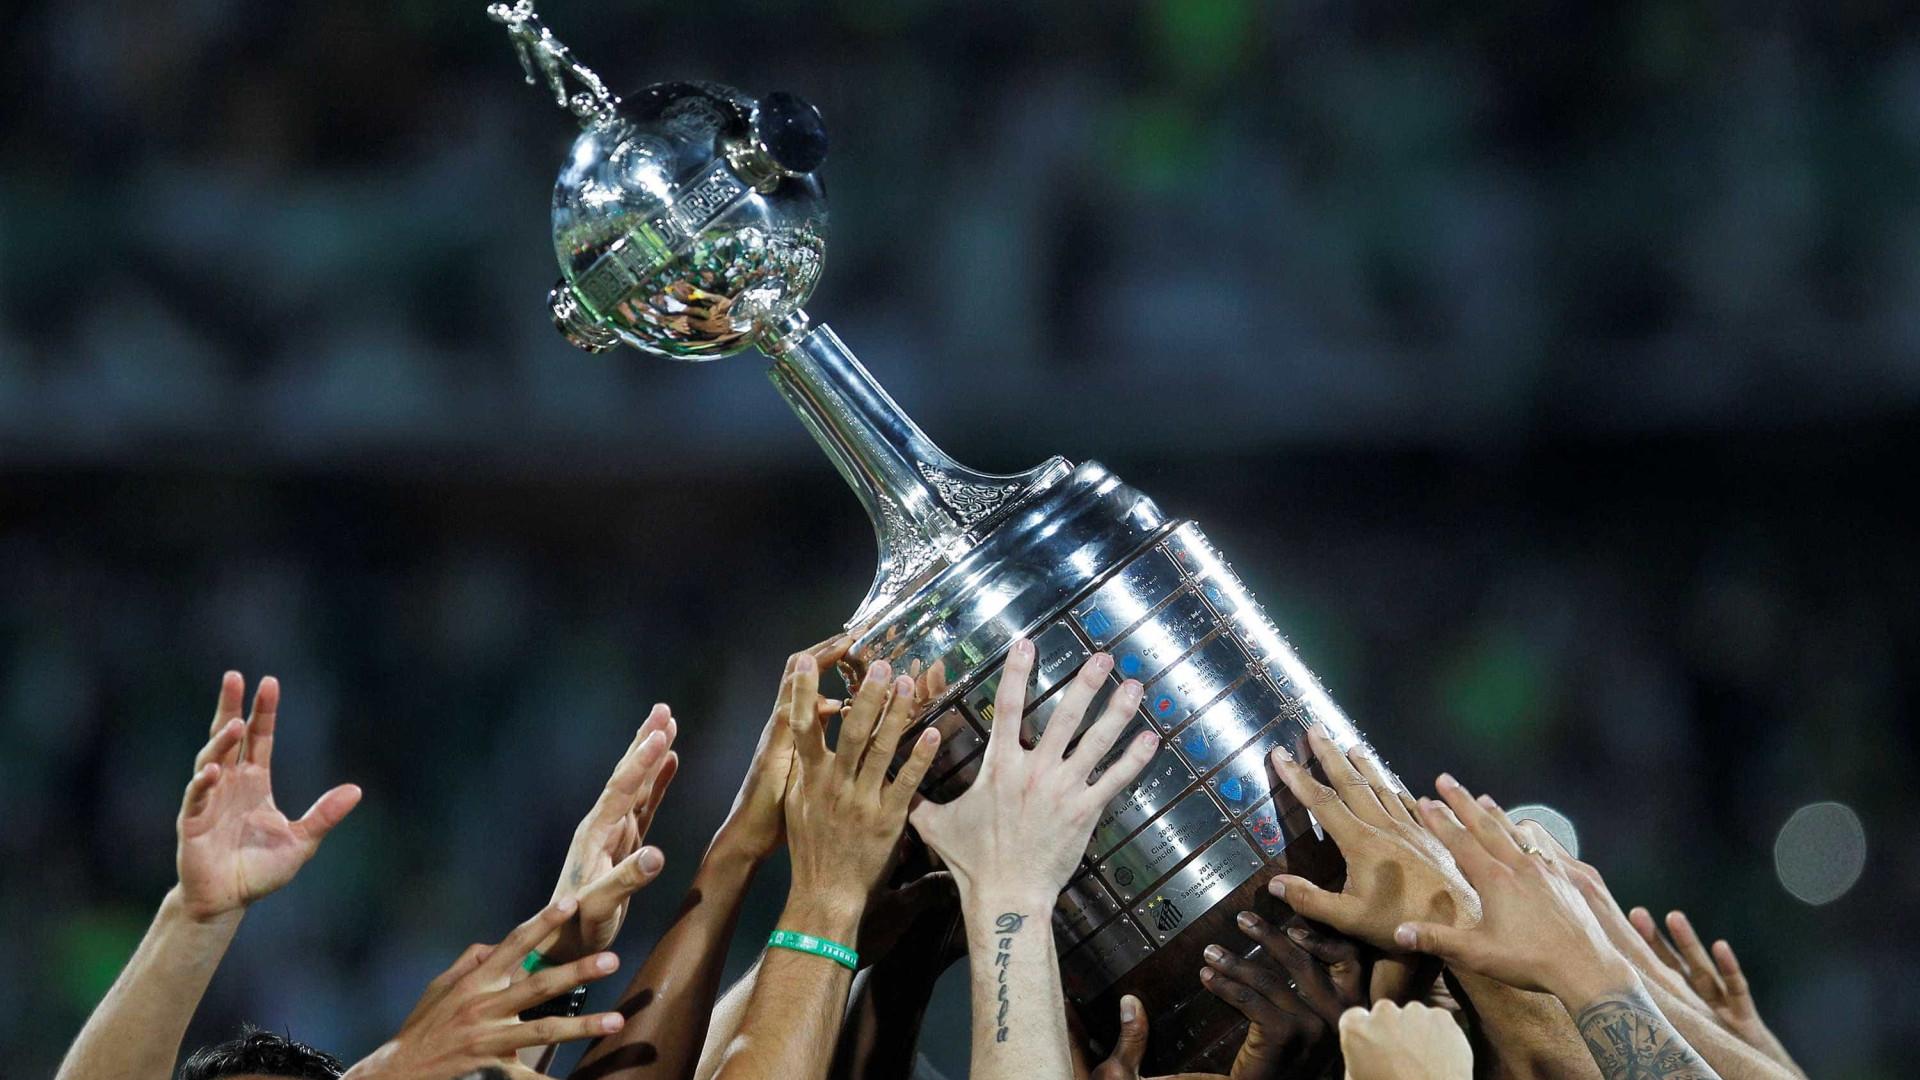 Termina a fase de grupos da Libertadores; 6 times brasileiros avançam. Palmeiras, Grêmio, Cruzeiro, Santos, Corinthians e Flamengo vão para o mata-mata